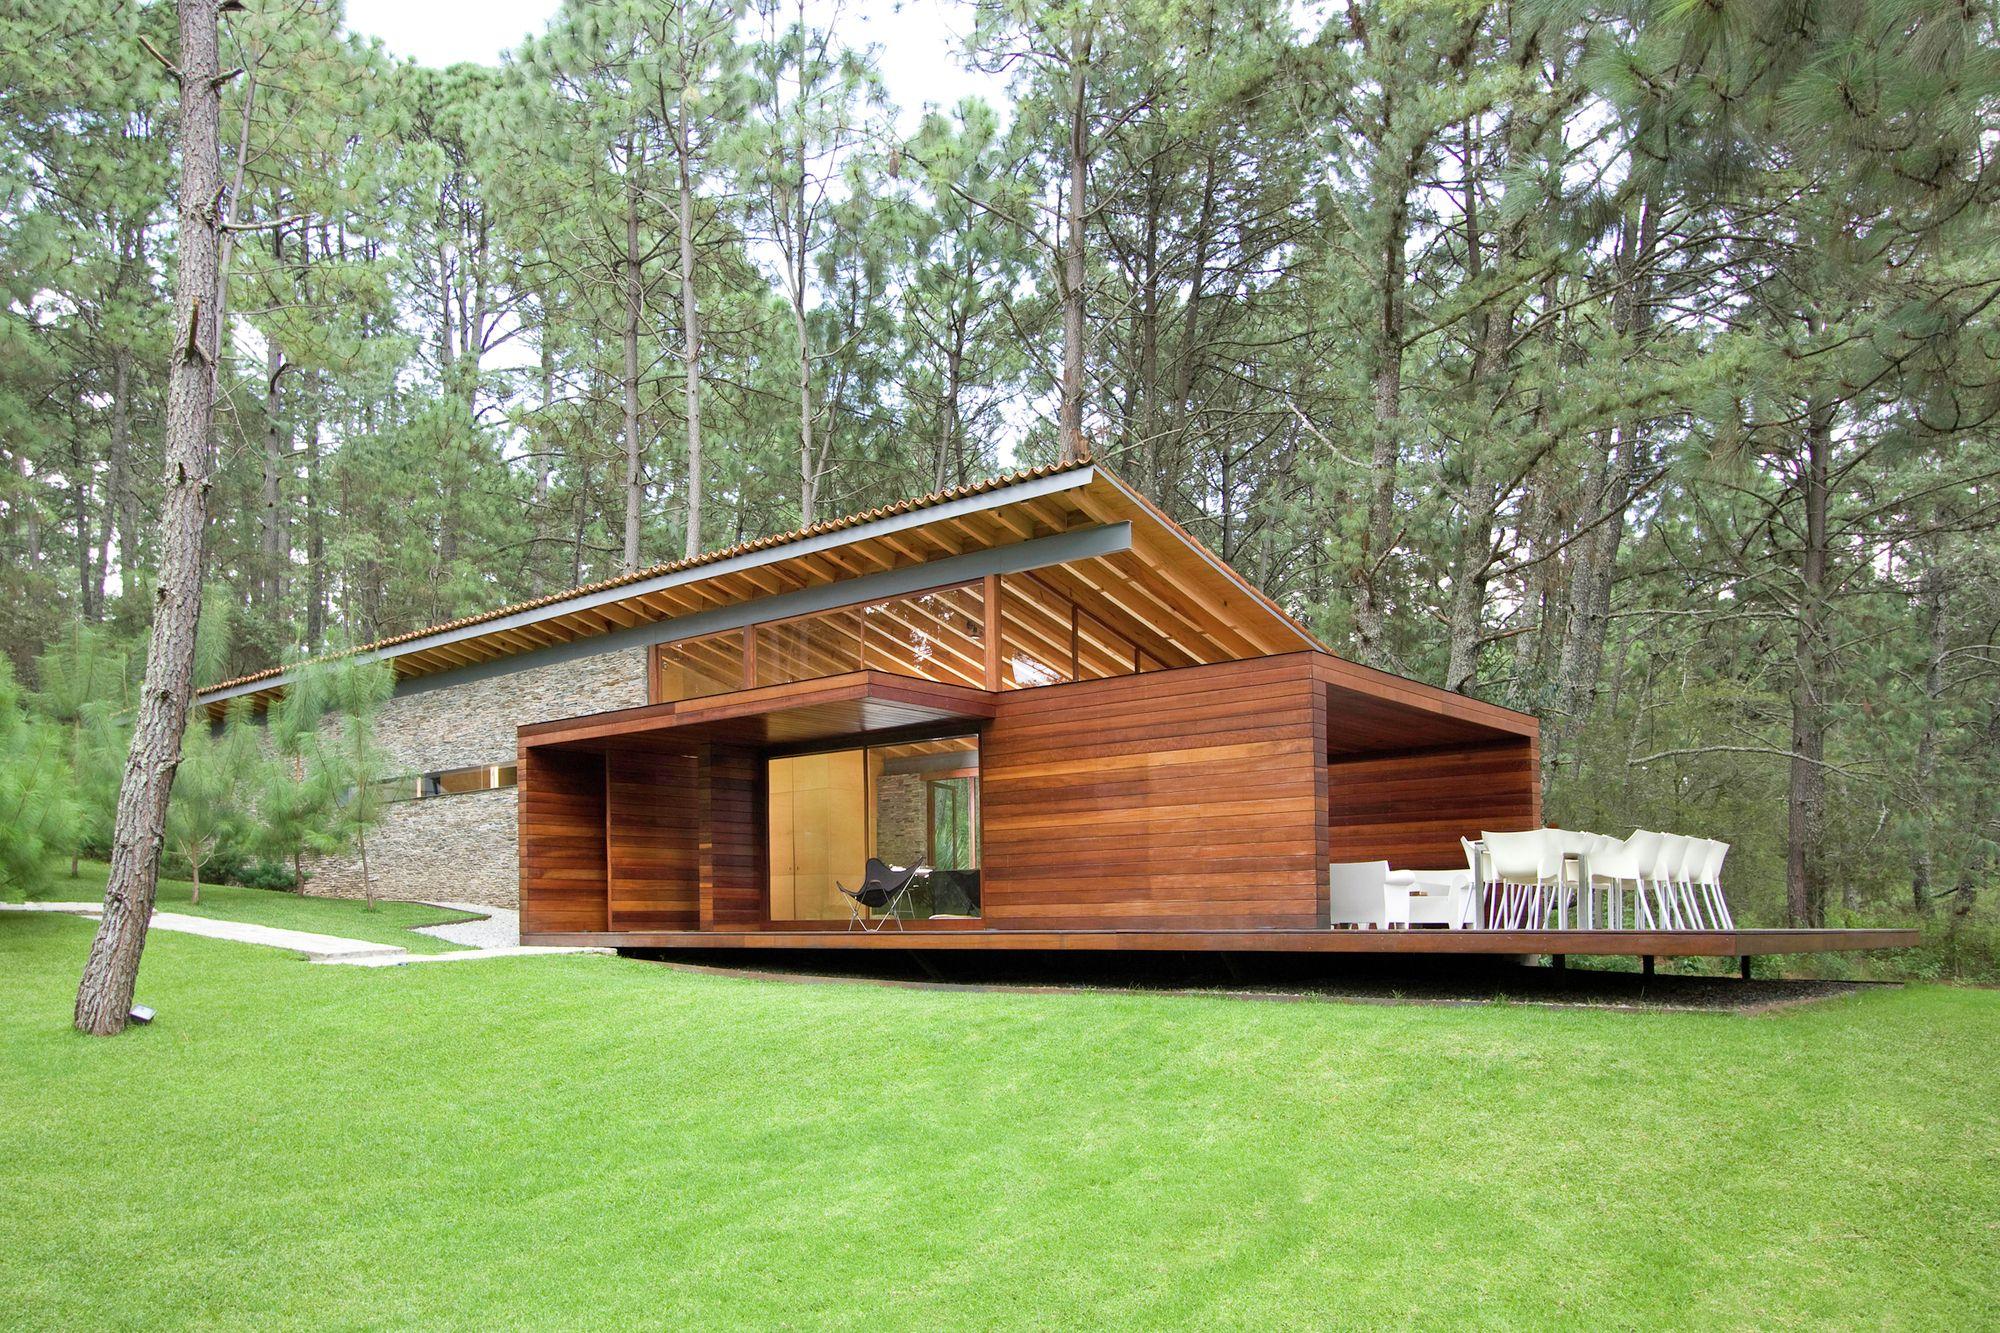 5067a02128ba0d2a7800006c_ro-house-tapalpa-el-as-rizo-arquitectos_portada_img_7967-jpg.jpg 2000×1333 pixelů